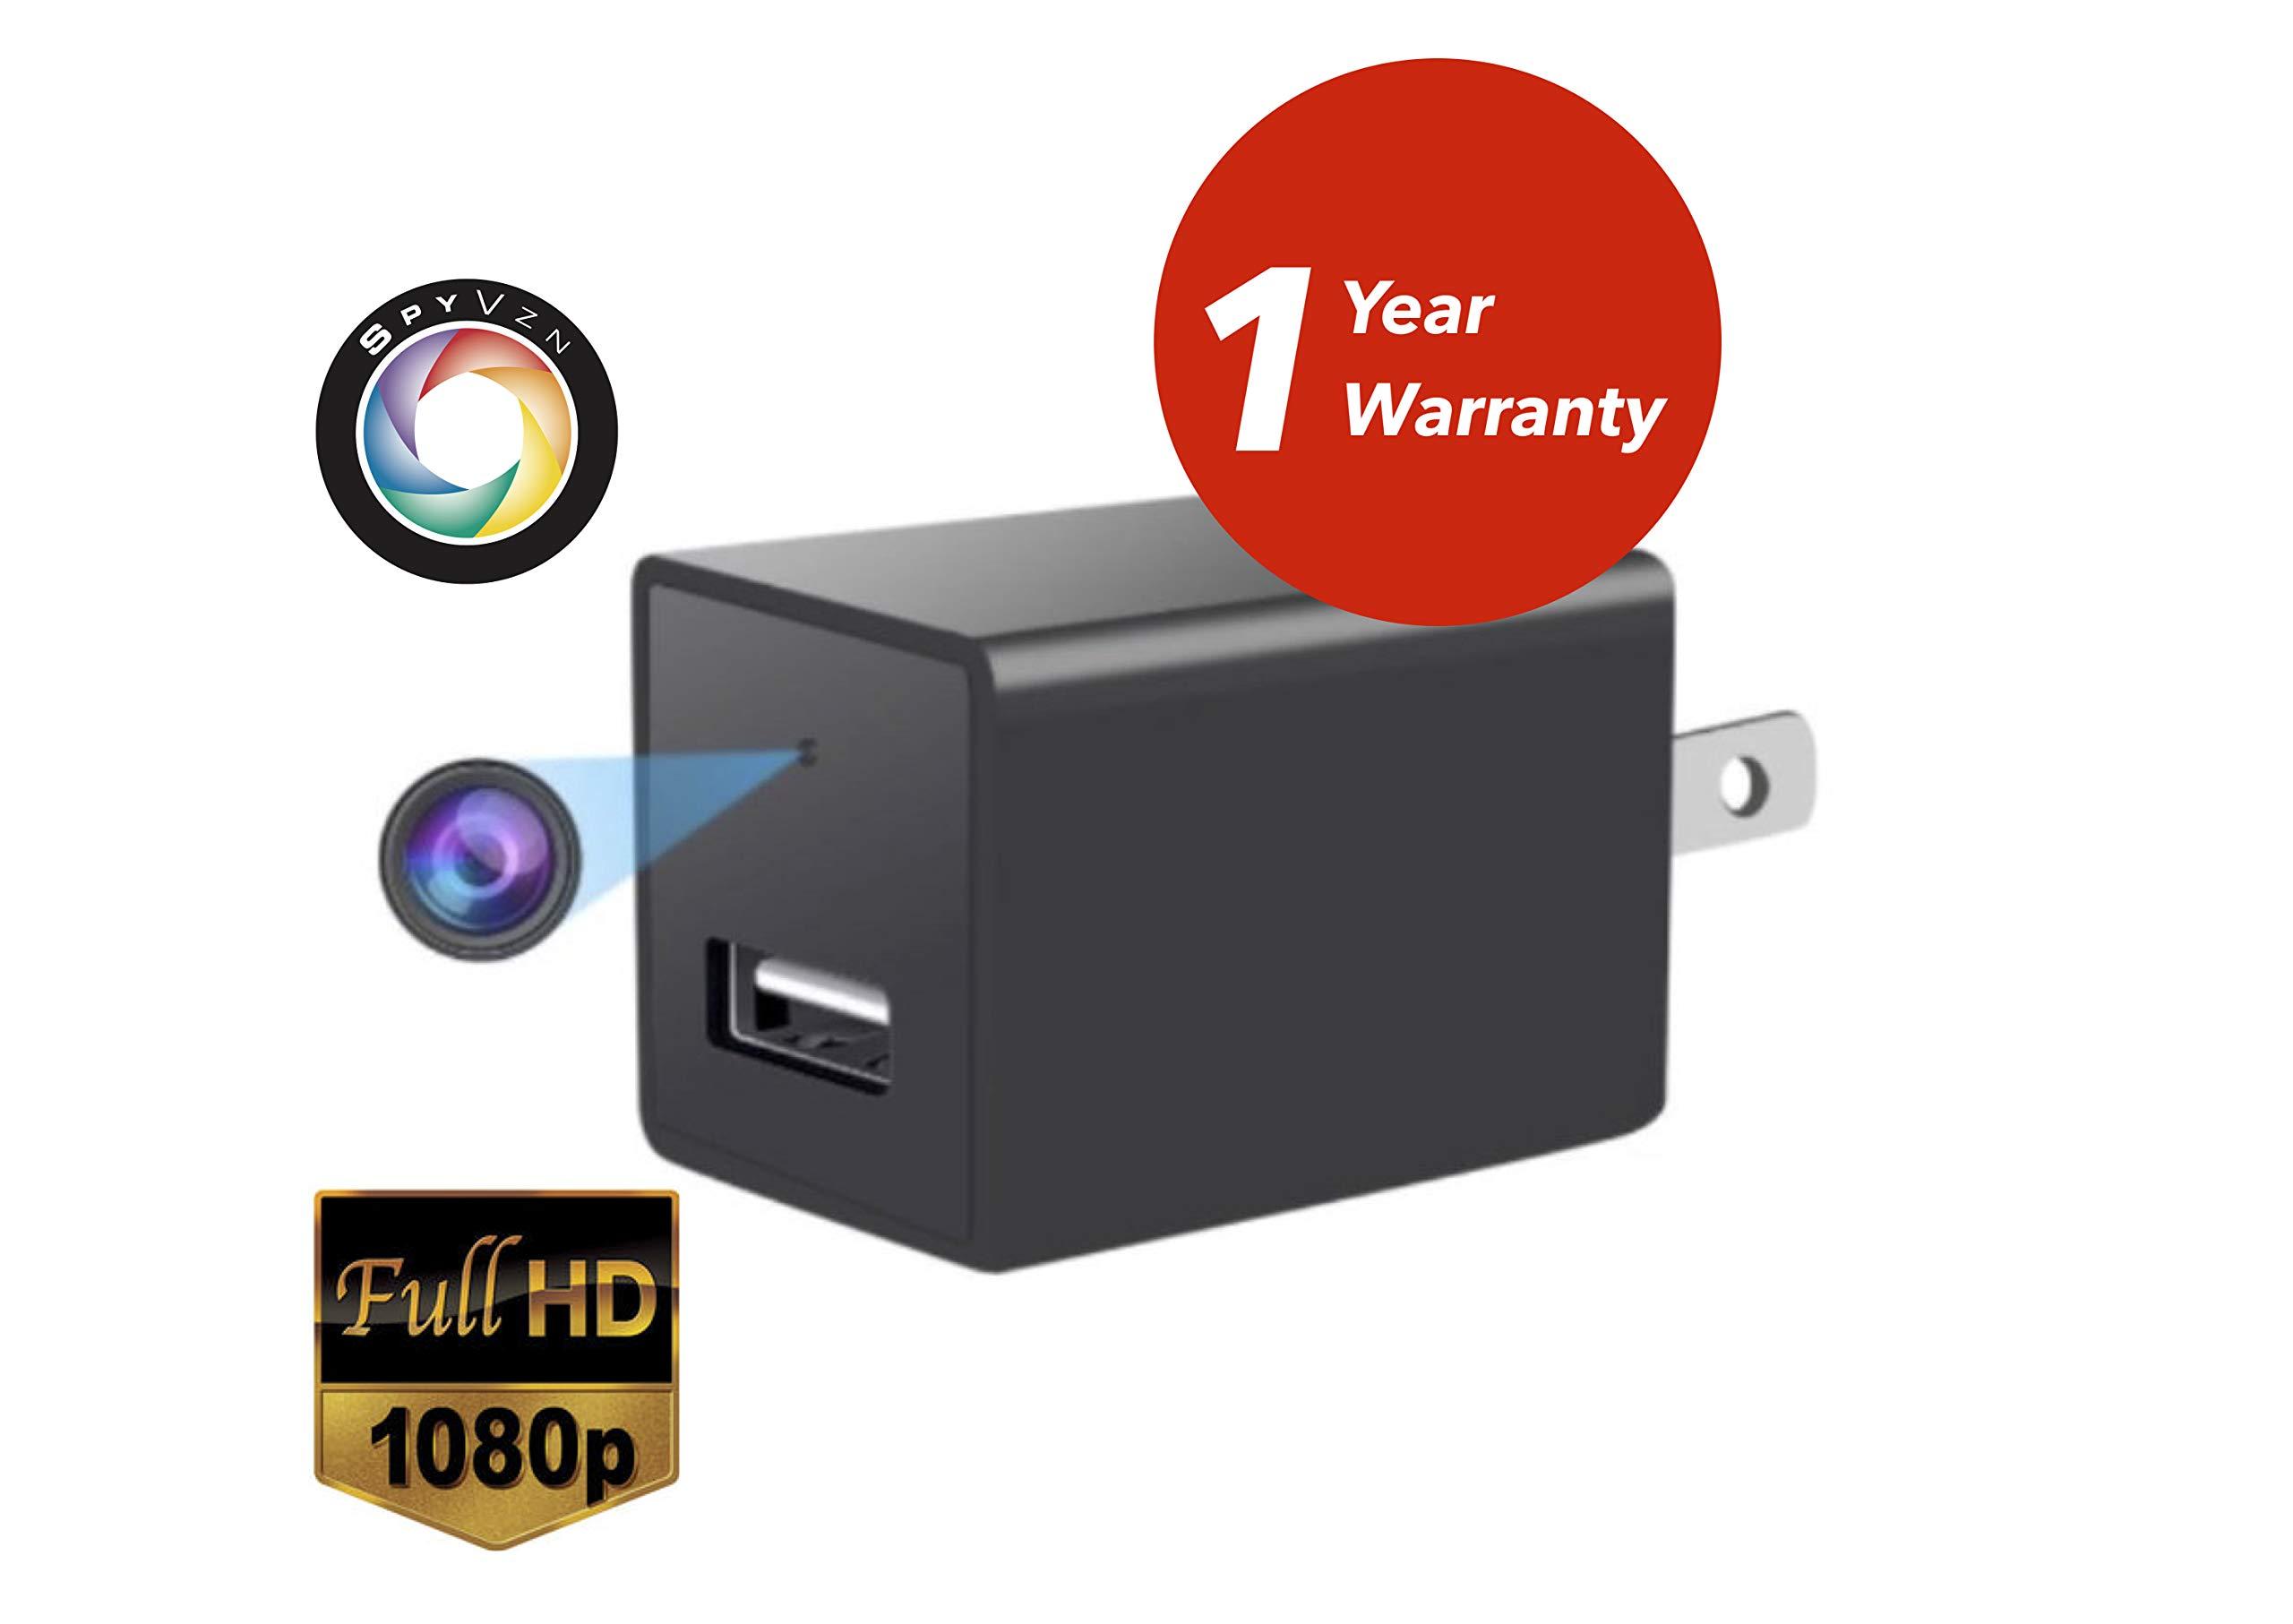 SpyVzn Hidden Spy Camera, WiFi USB Wall Charger Nanny Camera, 32GB SD Card Included